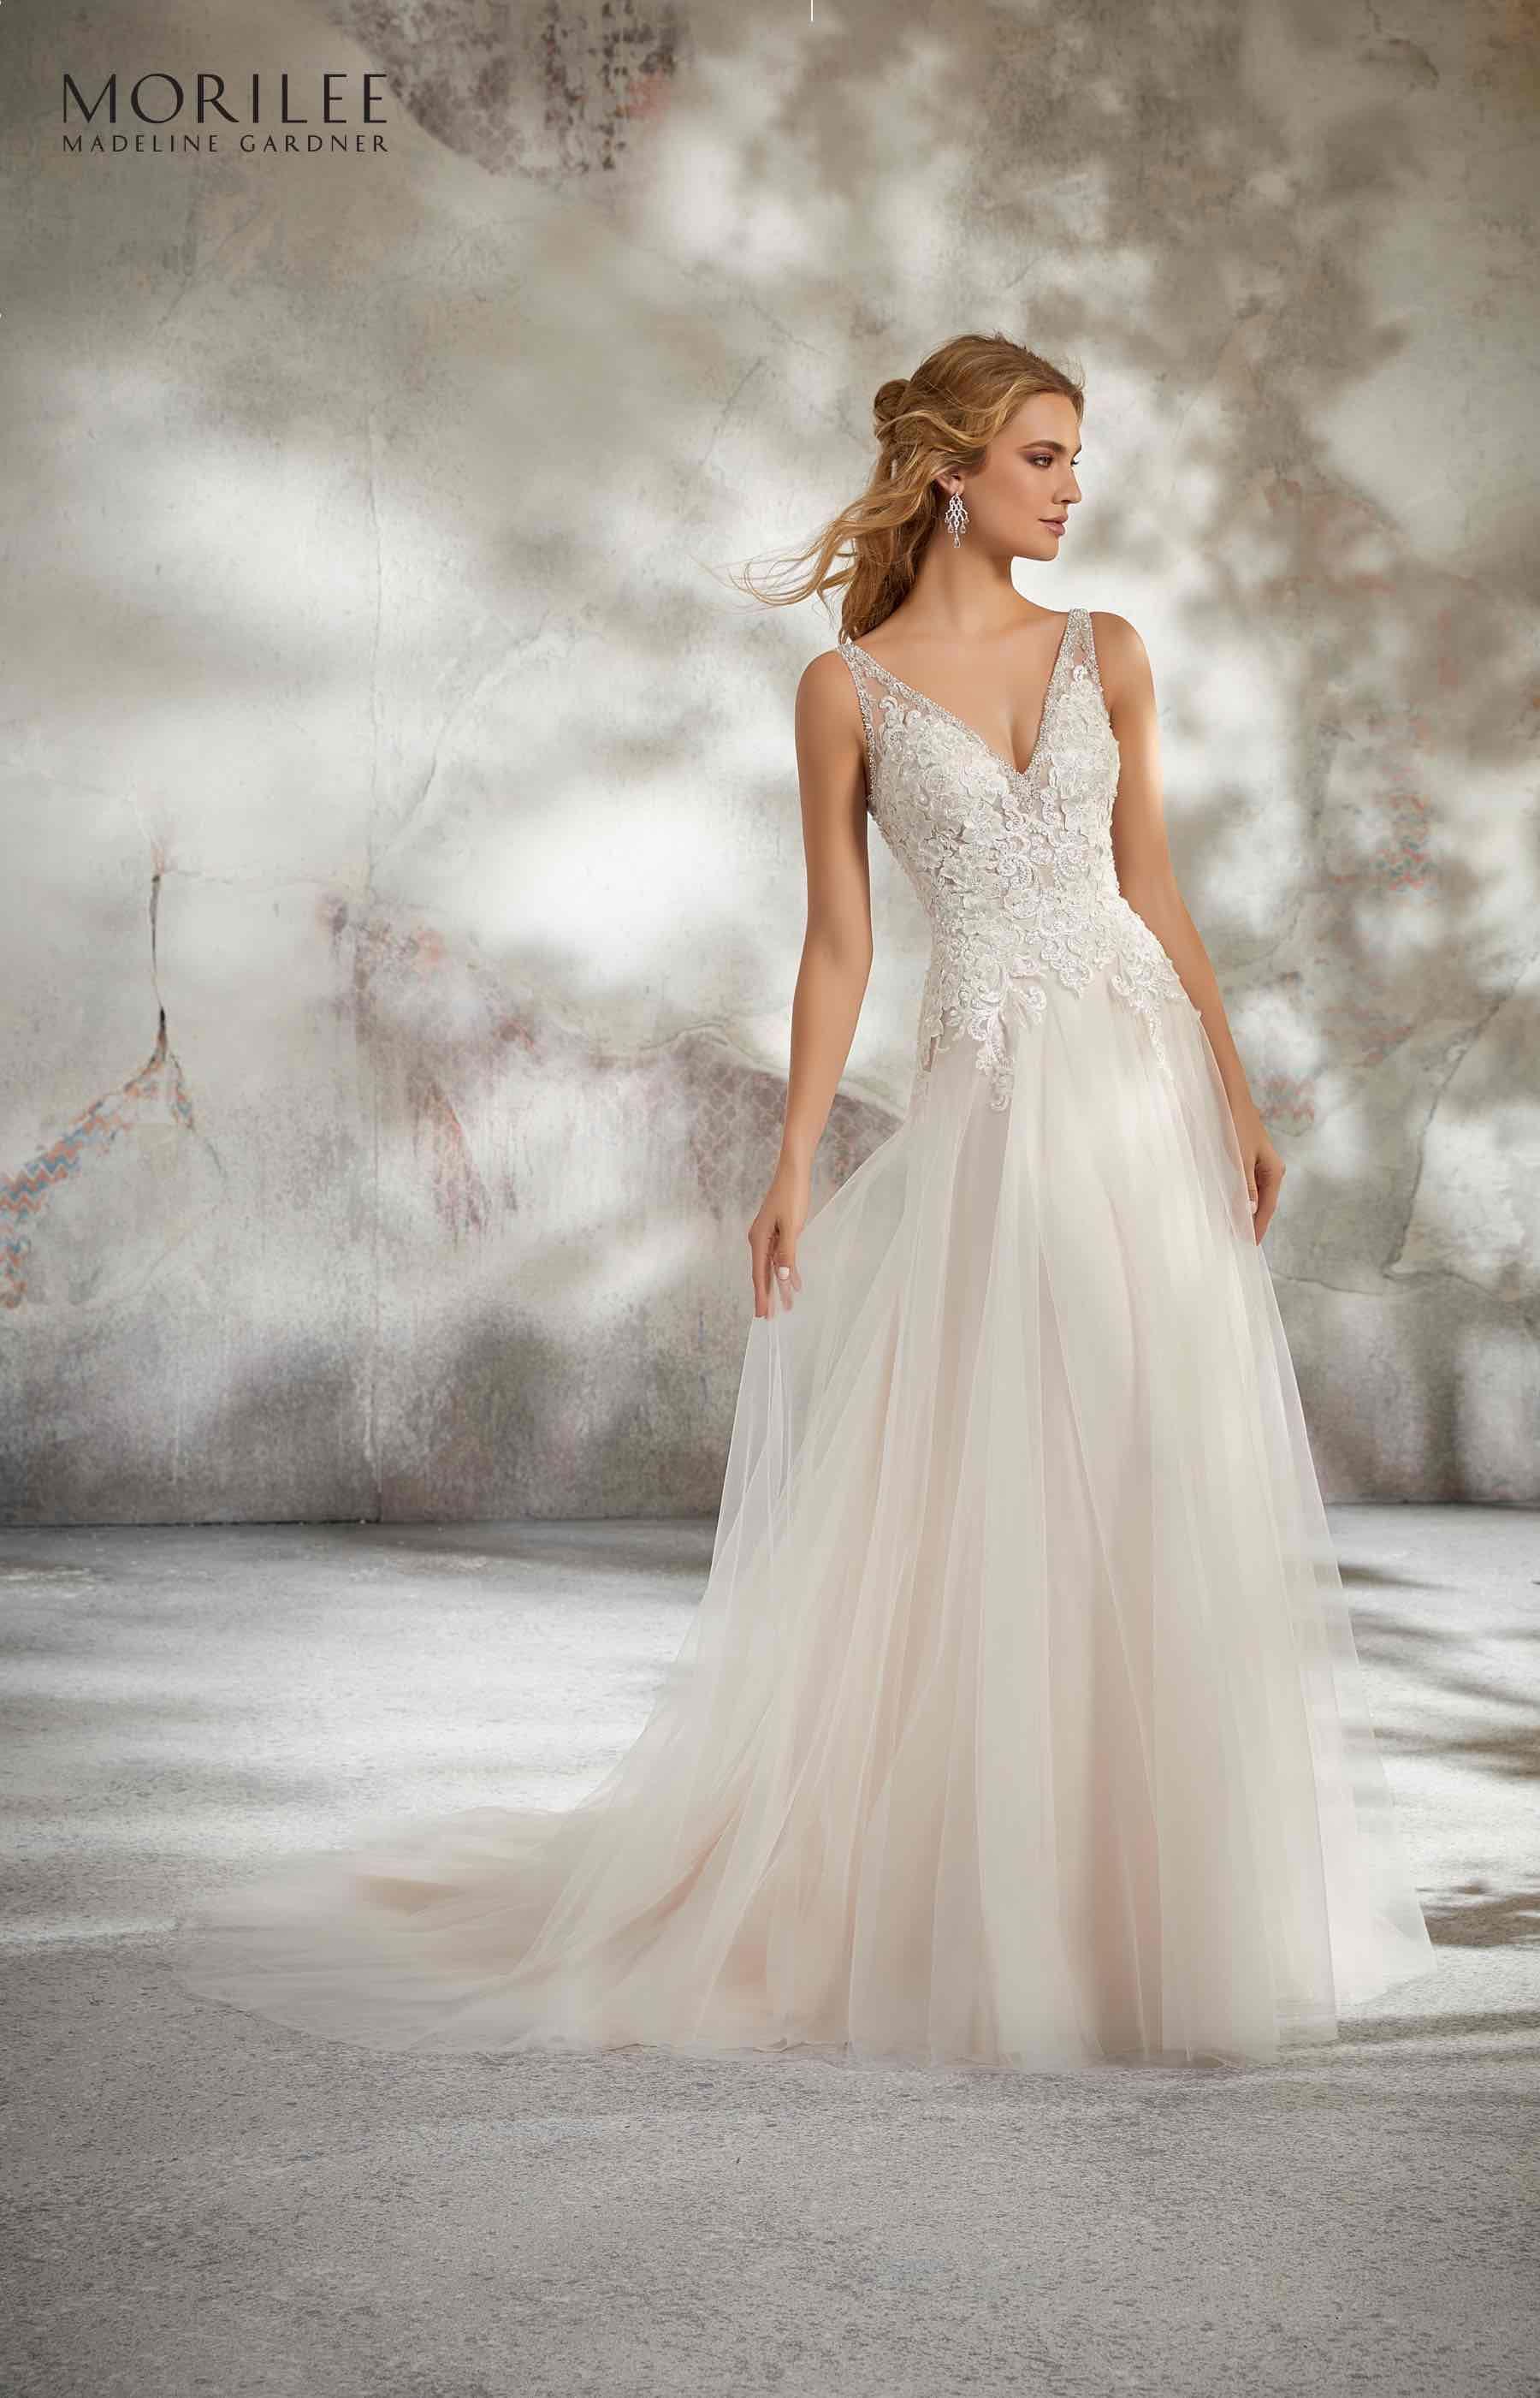 Sposa Vienna Morilee Brautmode Brautkleid Sposa Vienna Kleider Hochzeit Hochzeitskleid Braut